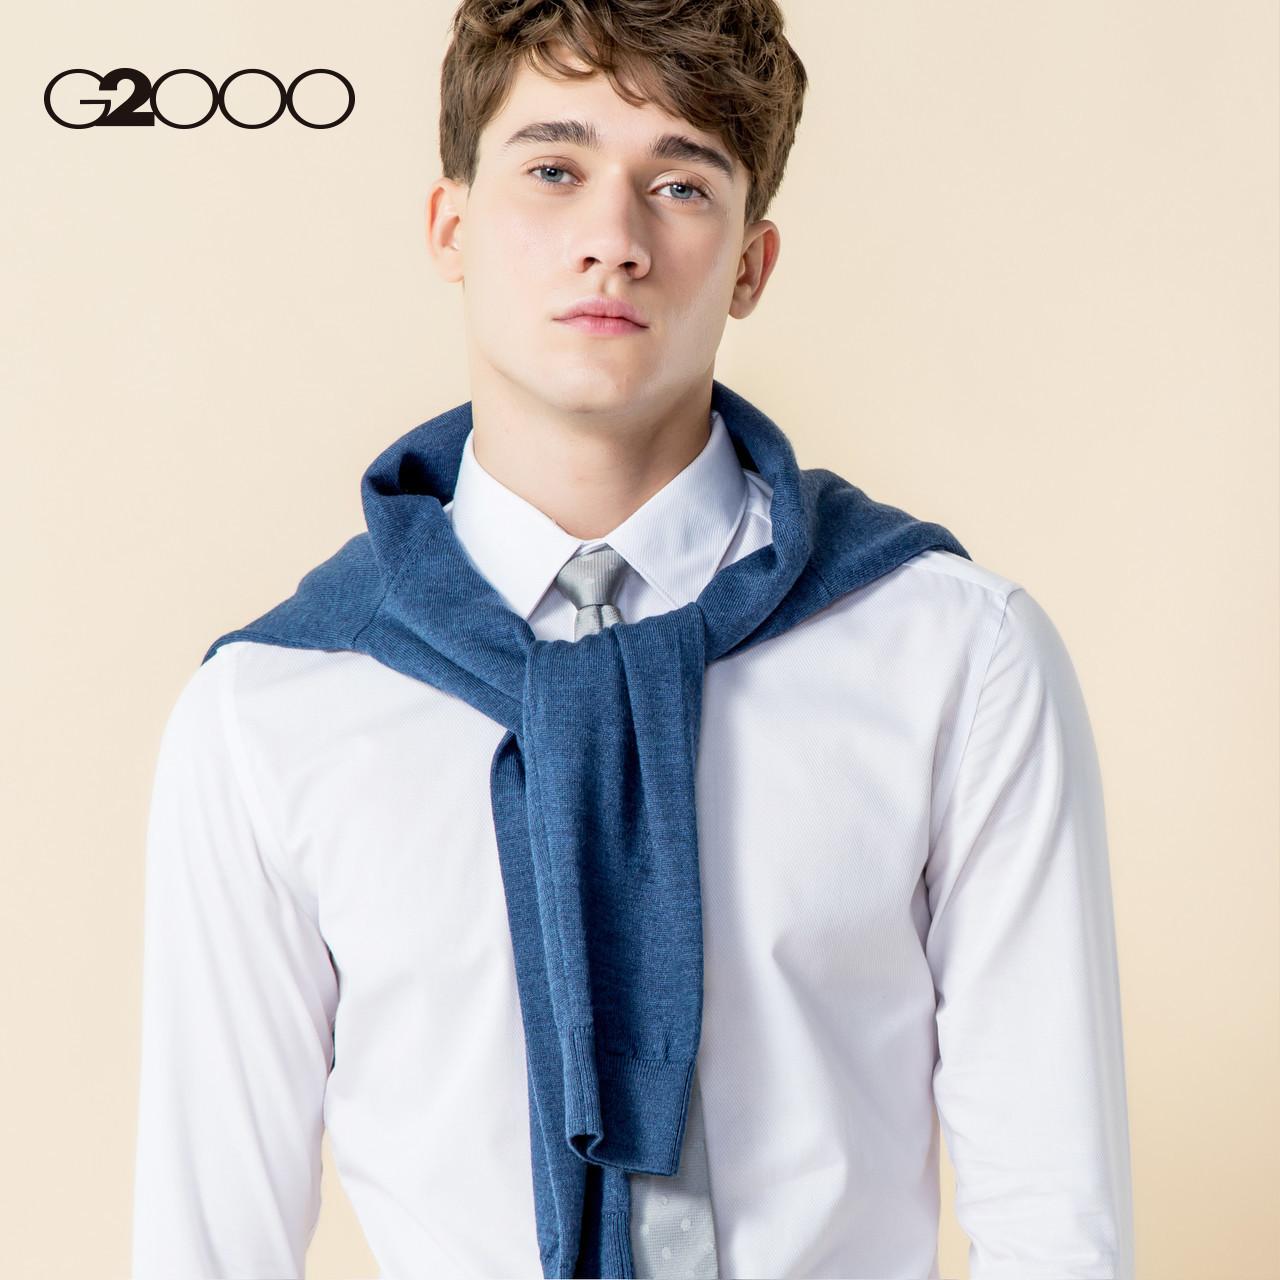 G2000休闲商务斜纹衬衫长袖男 2017秋冬新品男士上衣尖领修身衬衣